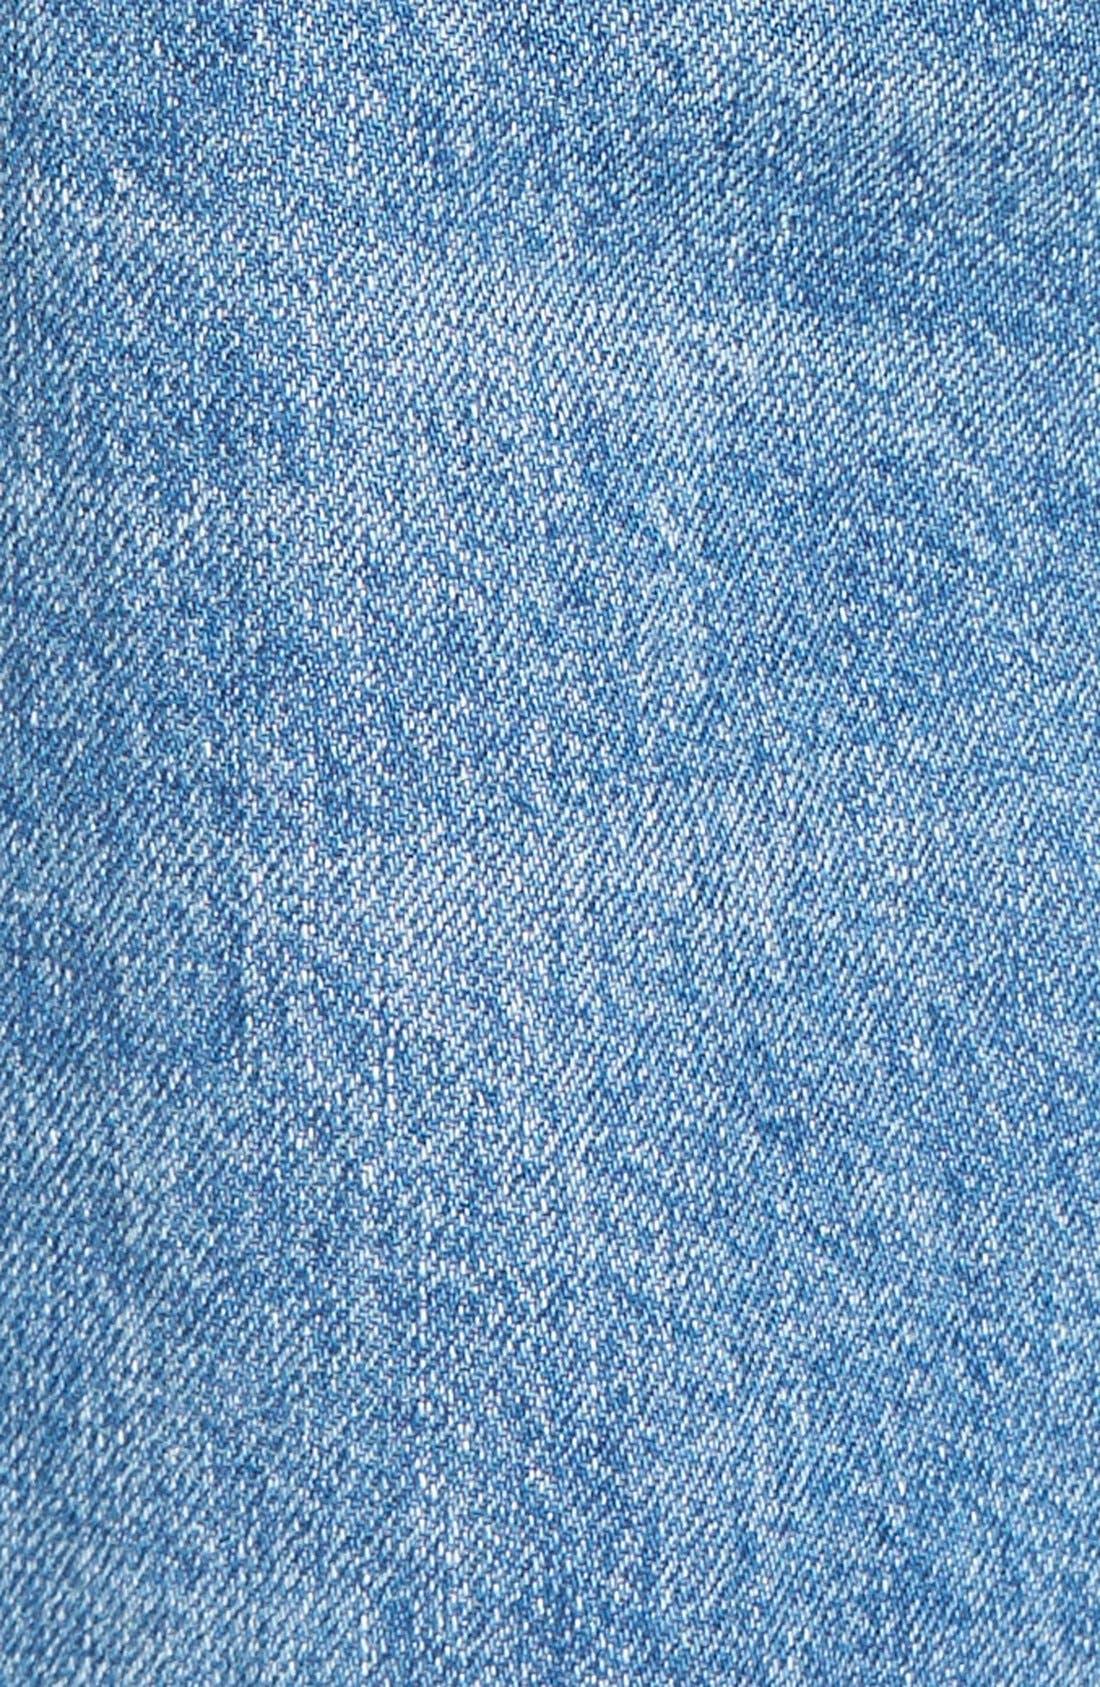 Hepburn High Rise Wide Leg Jeans,                             Alternate thumbnail 2, color,                             425